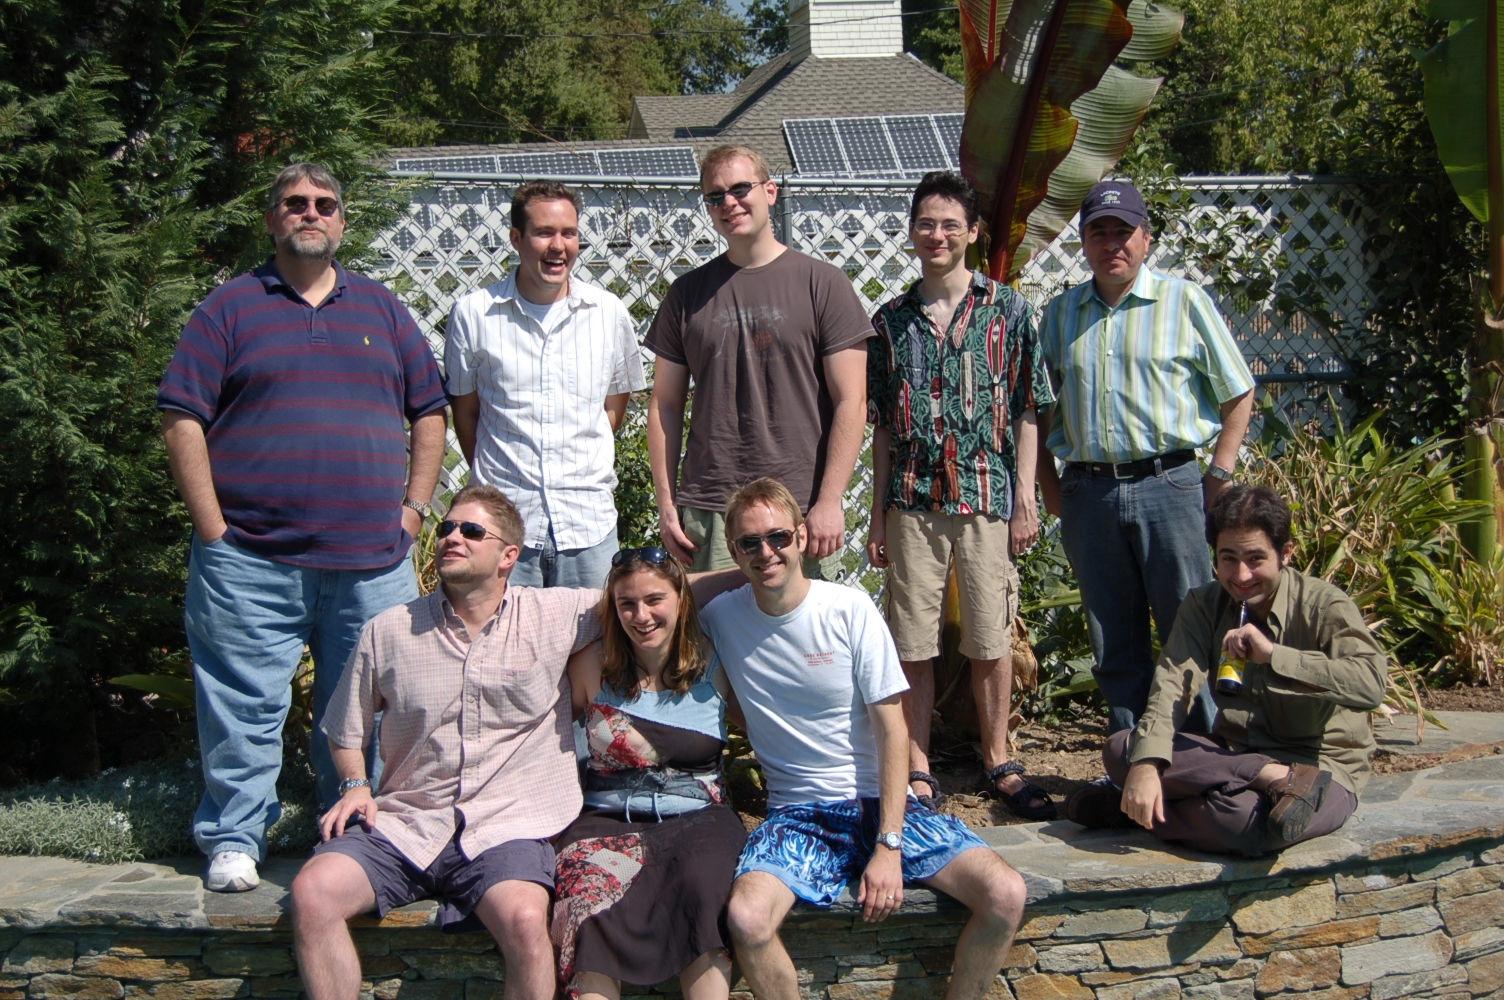 ab inventio Founding team, March 31st 2007